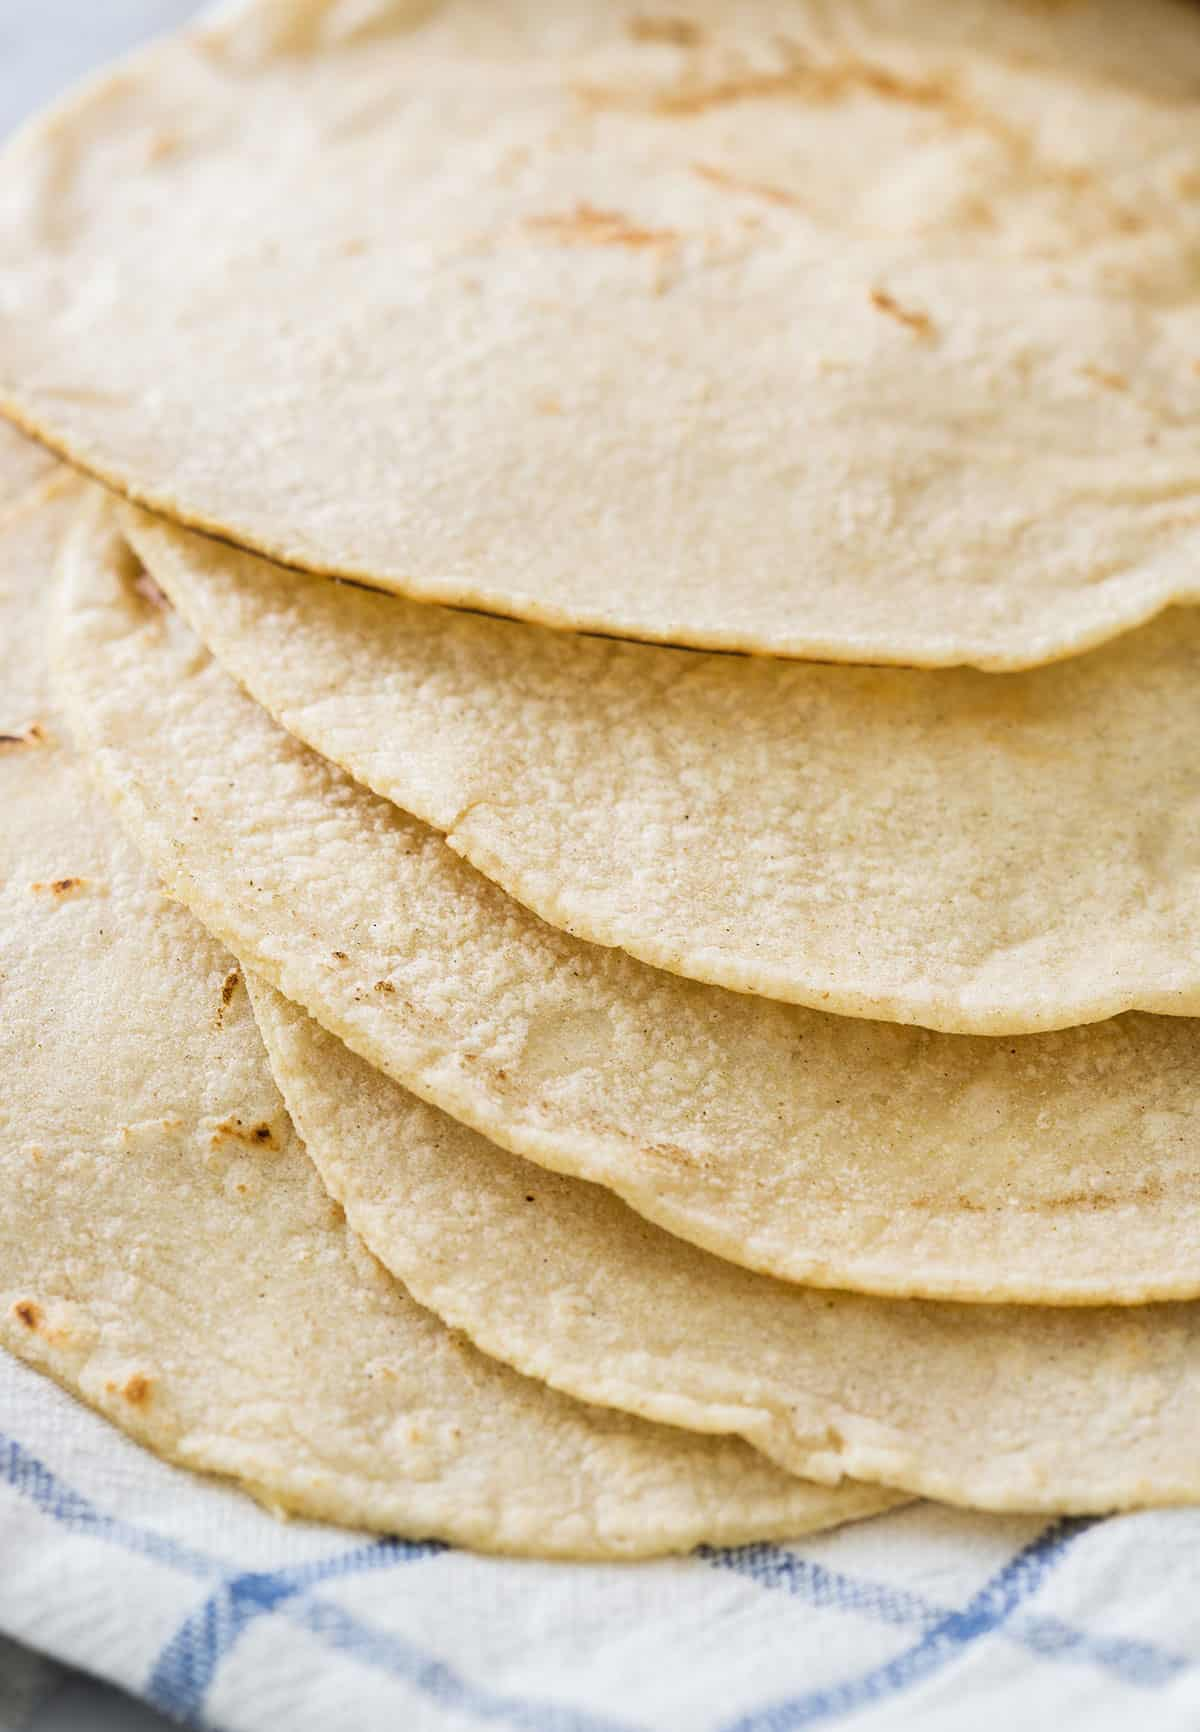 A close up of corn tortillas texture.